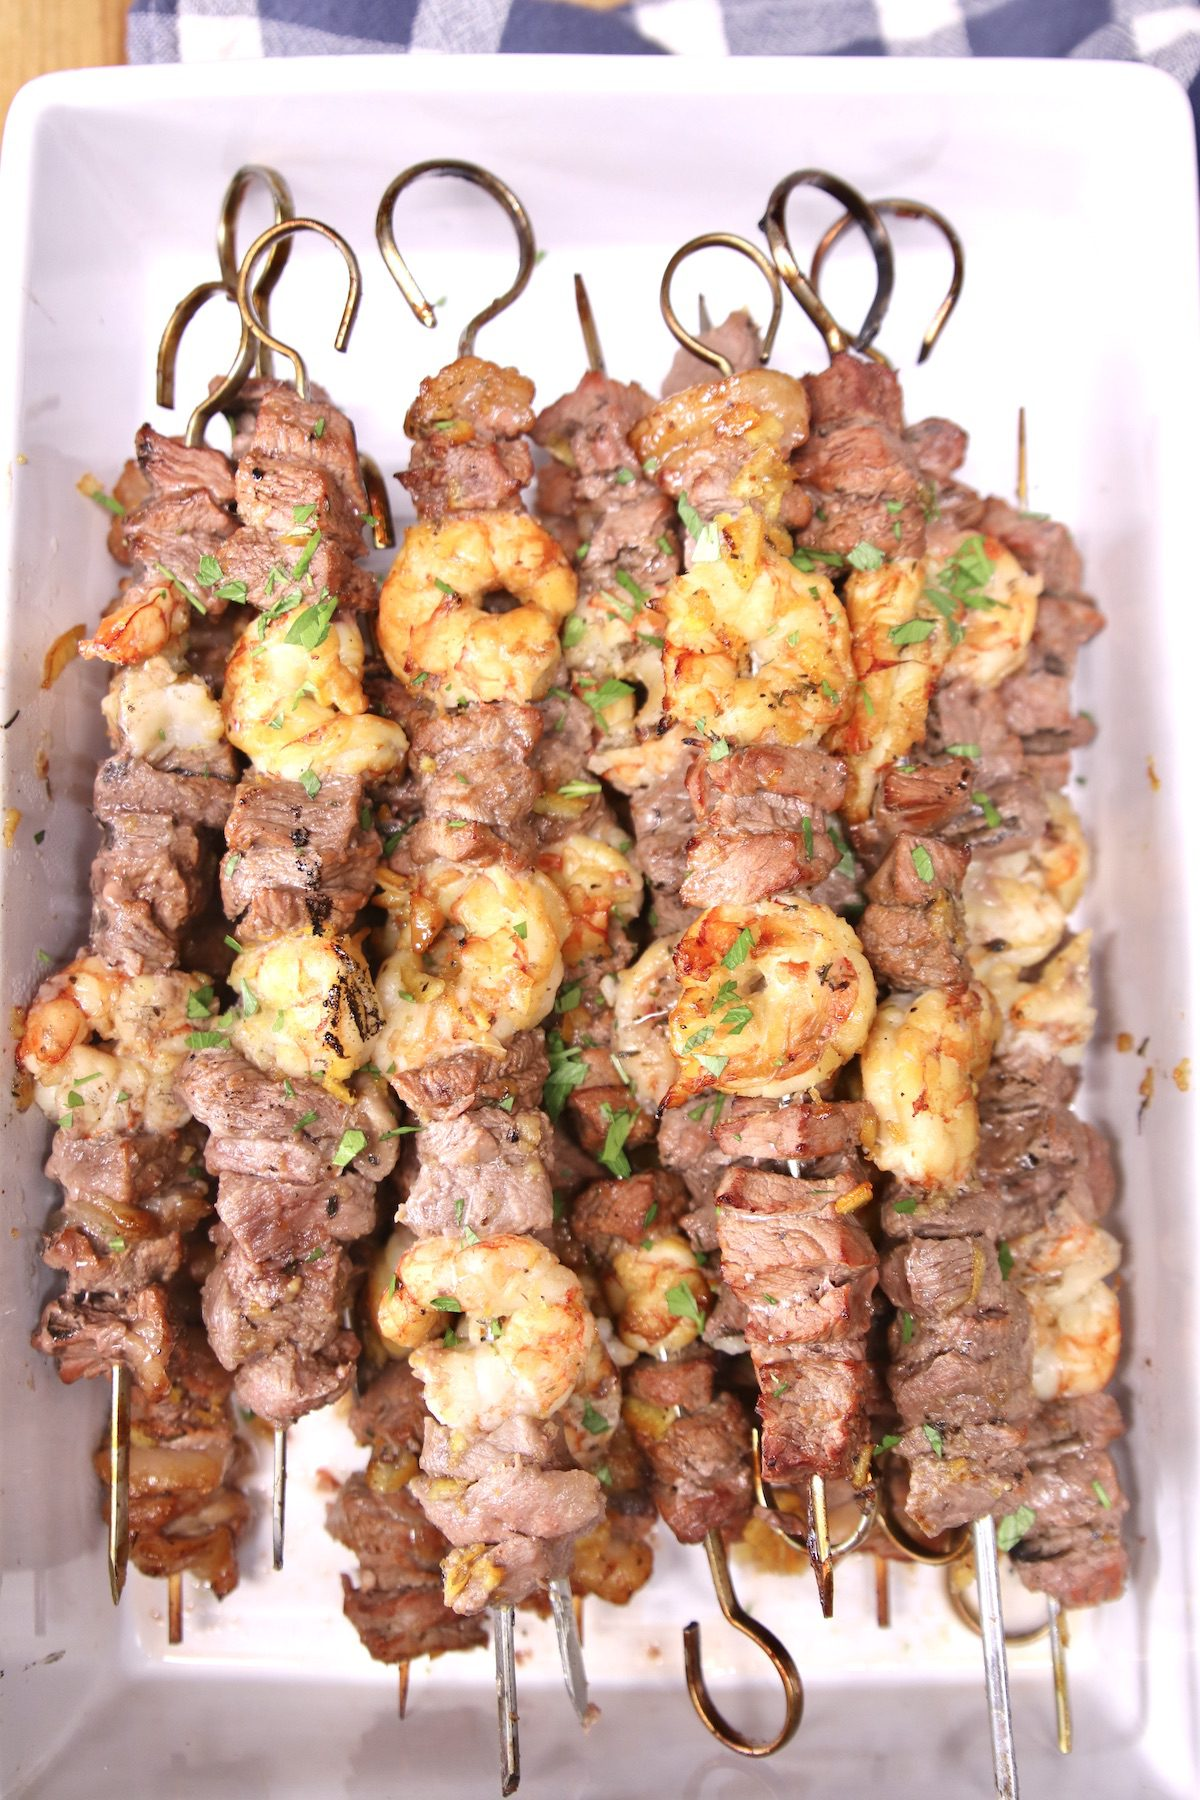 grilled shrimp and steak skewers